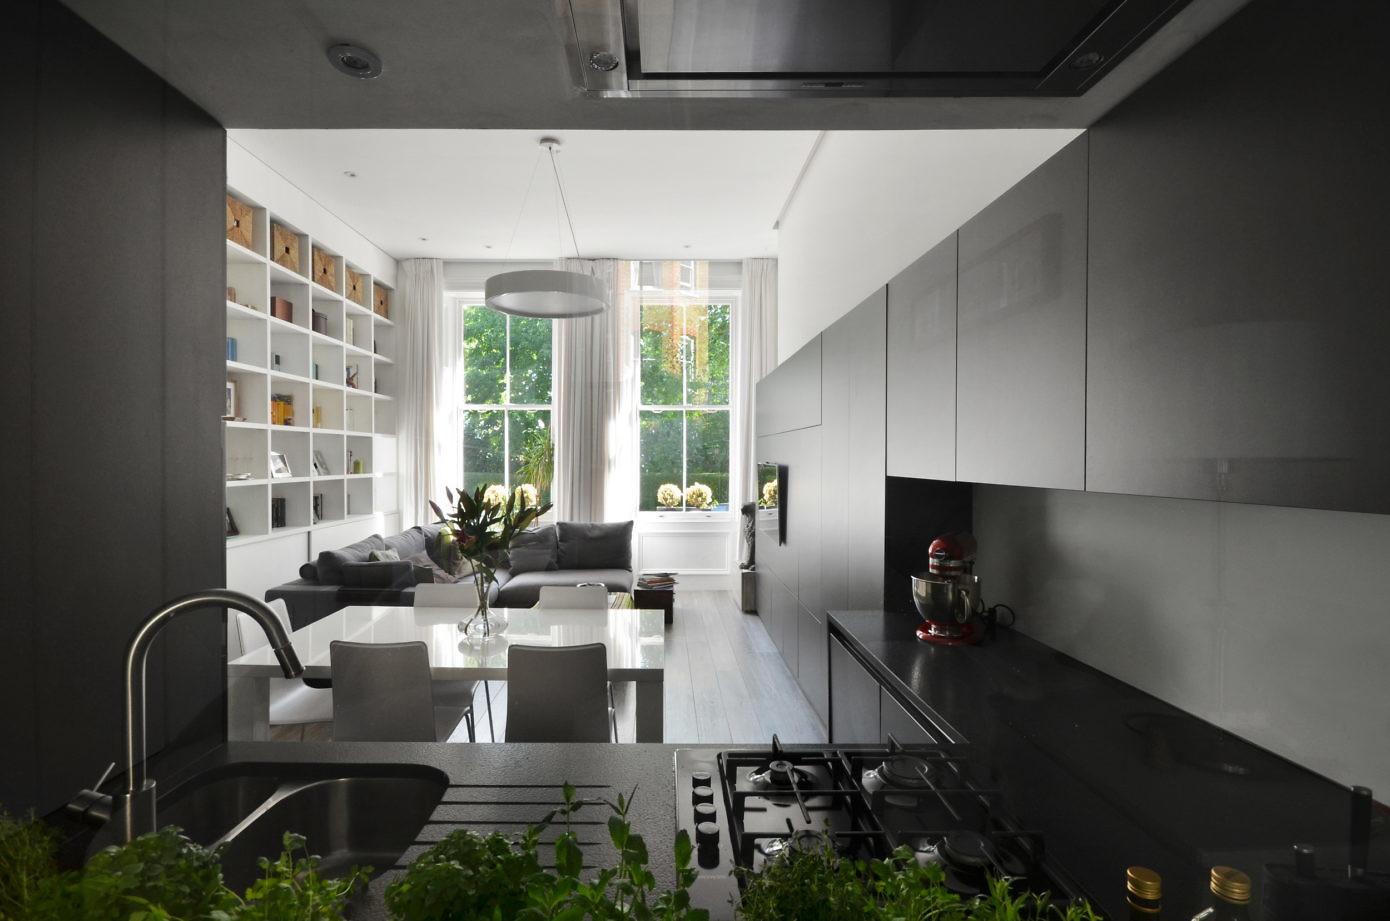 Nevern Square Apartment by Daniele Petteno Architecture Workshop